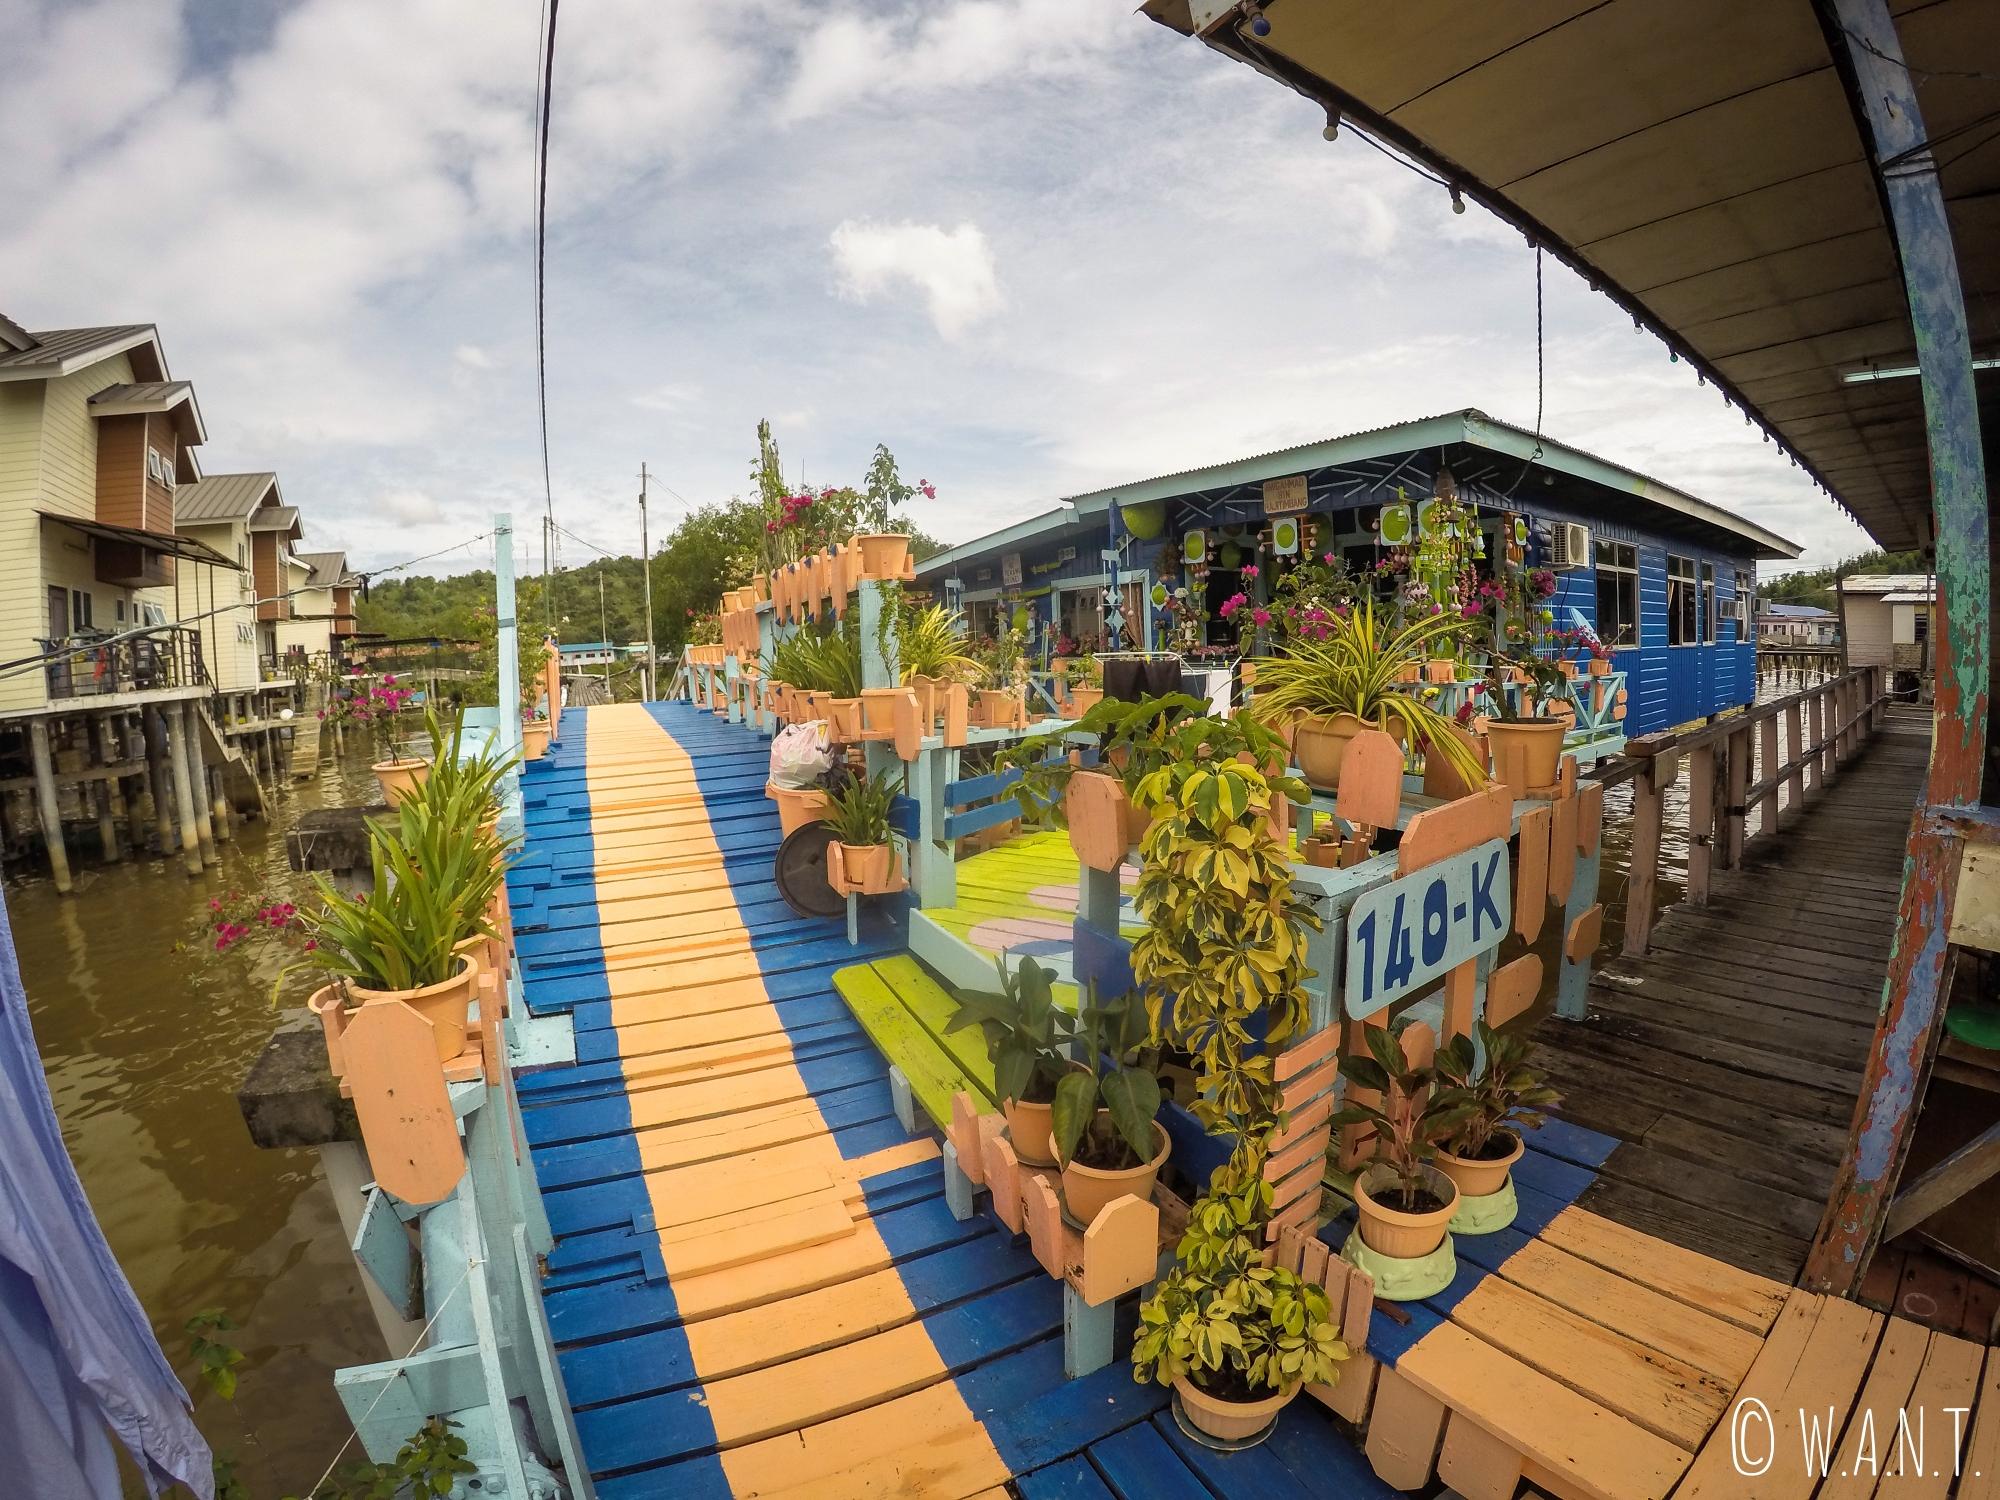 Maison colorée de Kampong Ayer à Bandar Seri Begawan